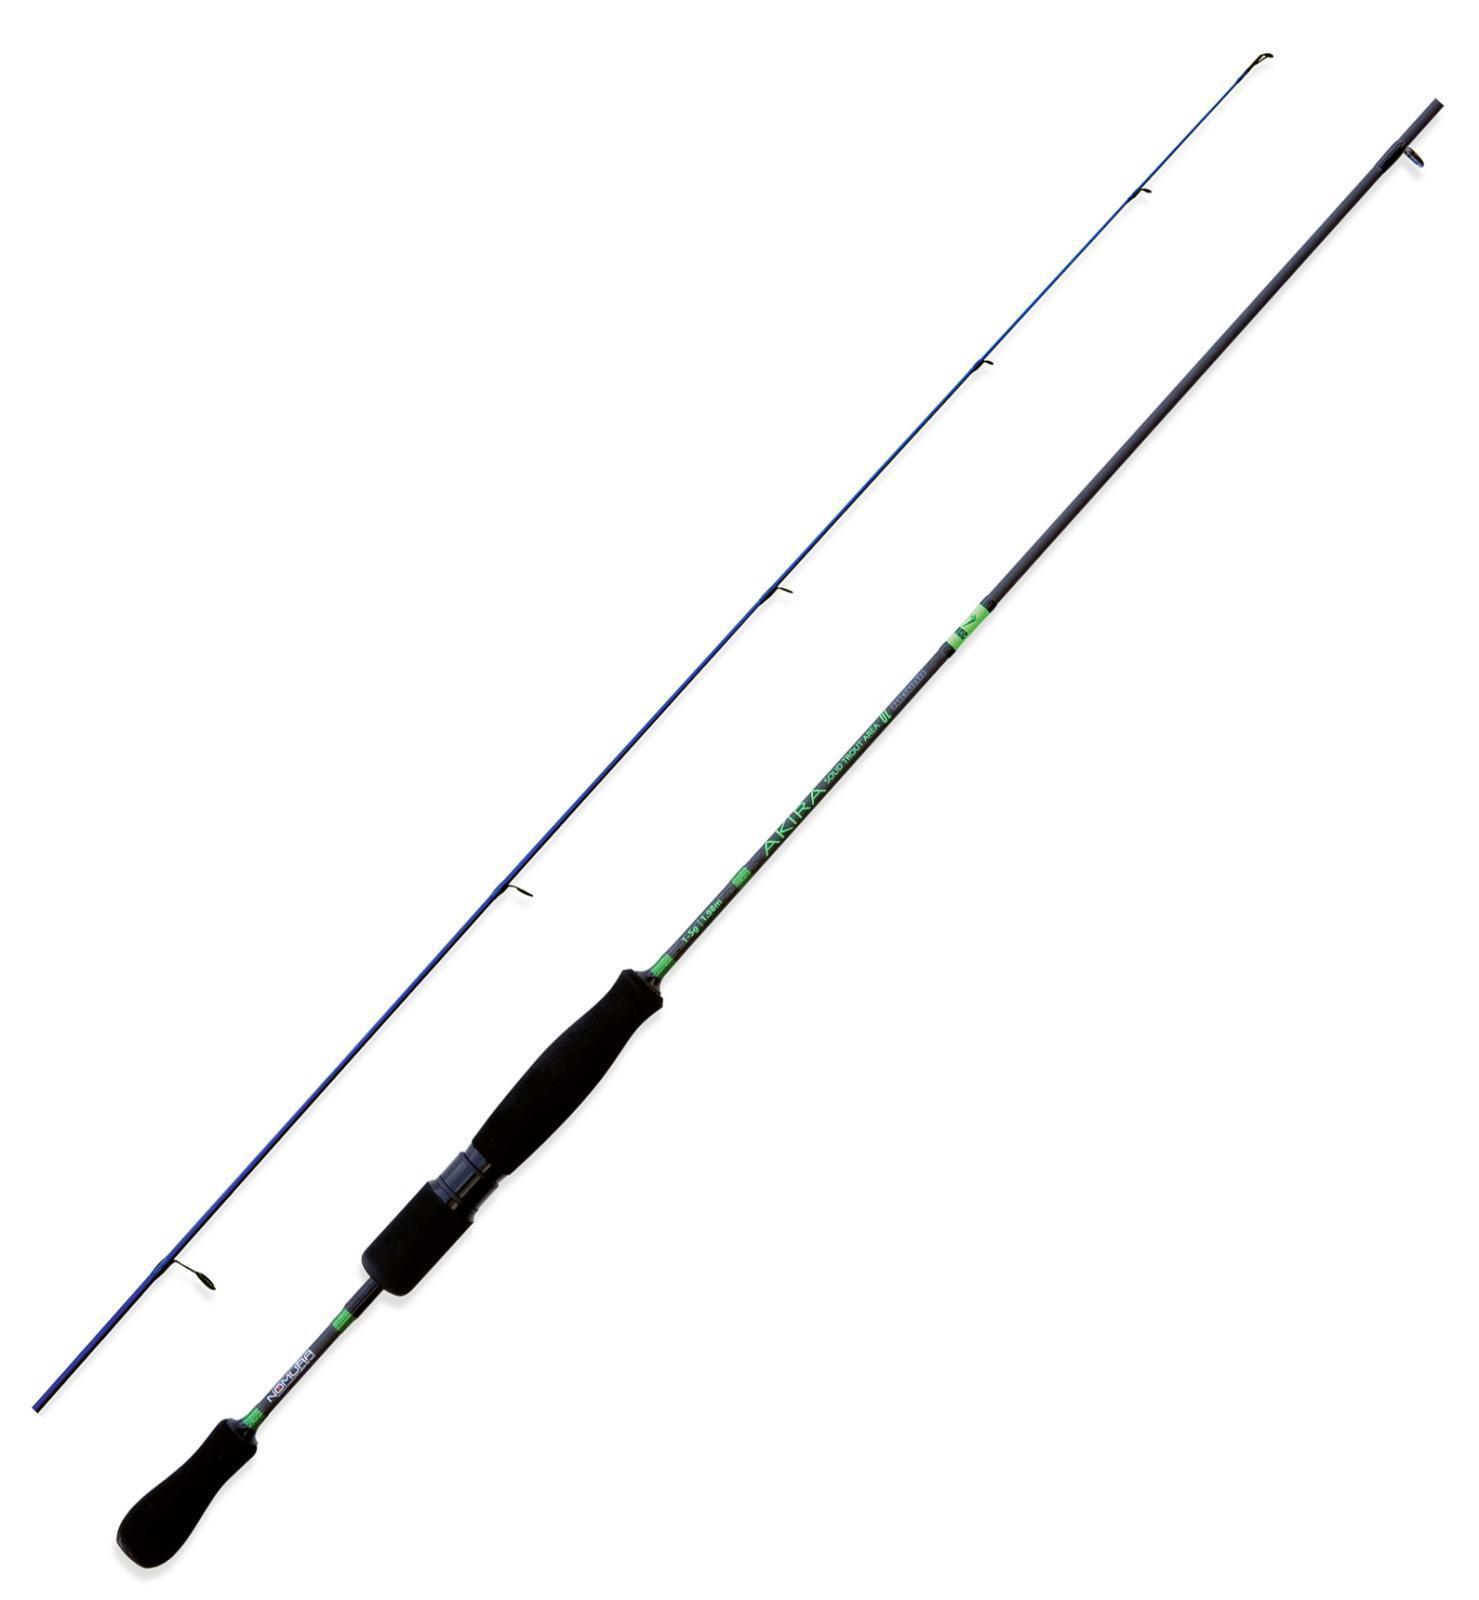 Nm20520518 fishing rod nomura trout zone akira solid 1.80cm 1-5 gr